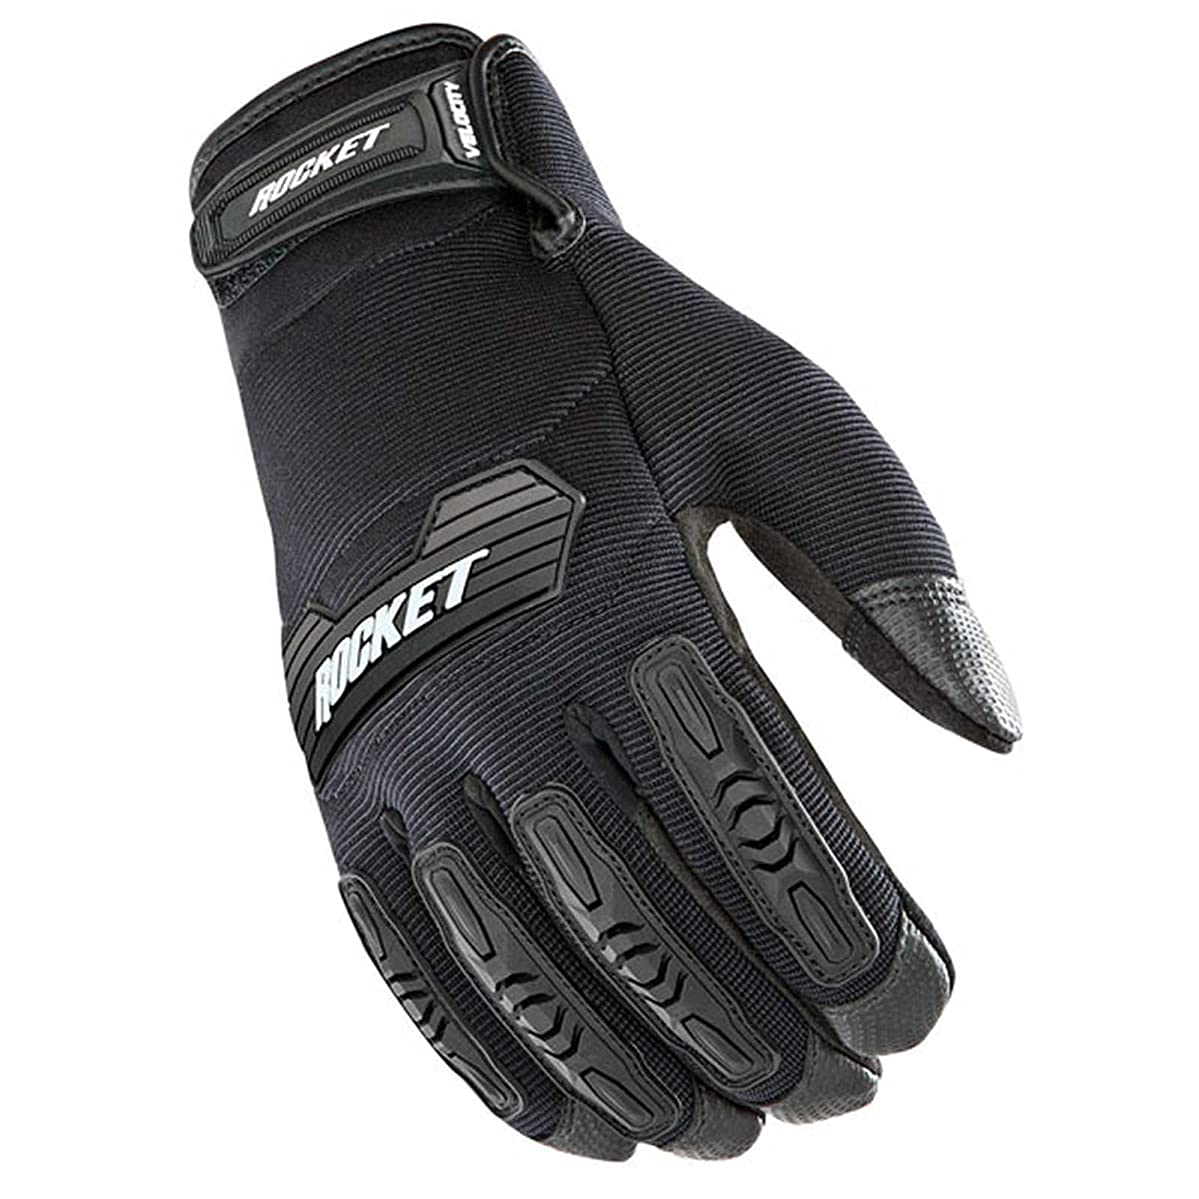 Joe Rocket Velocity 2.0 Men's Textile Street Motorcycle Gloves - Black/Black/Large